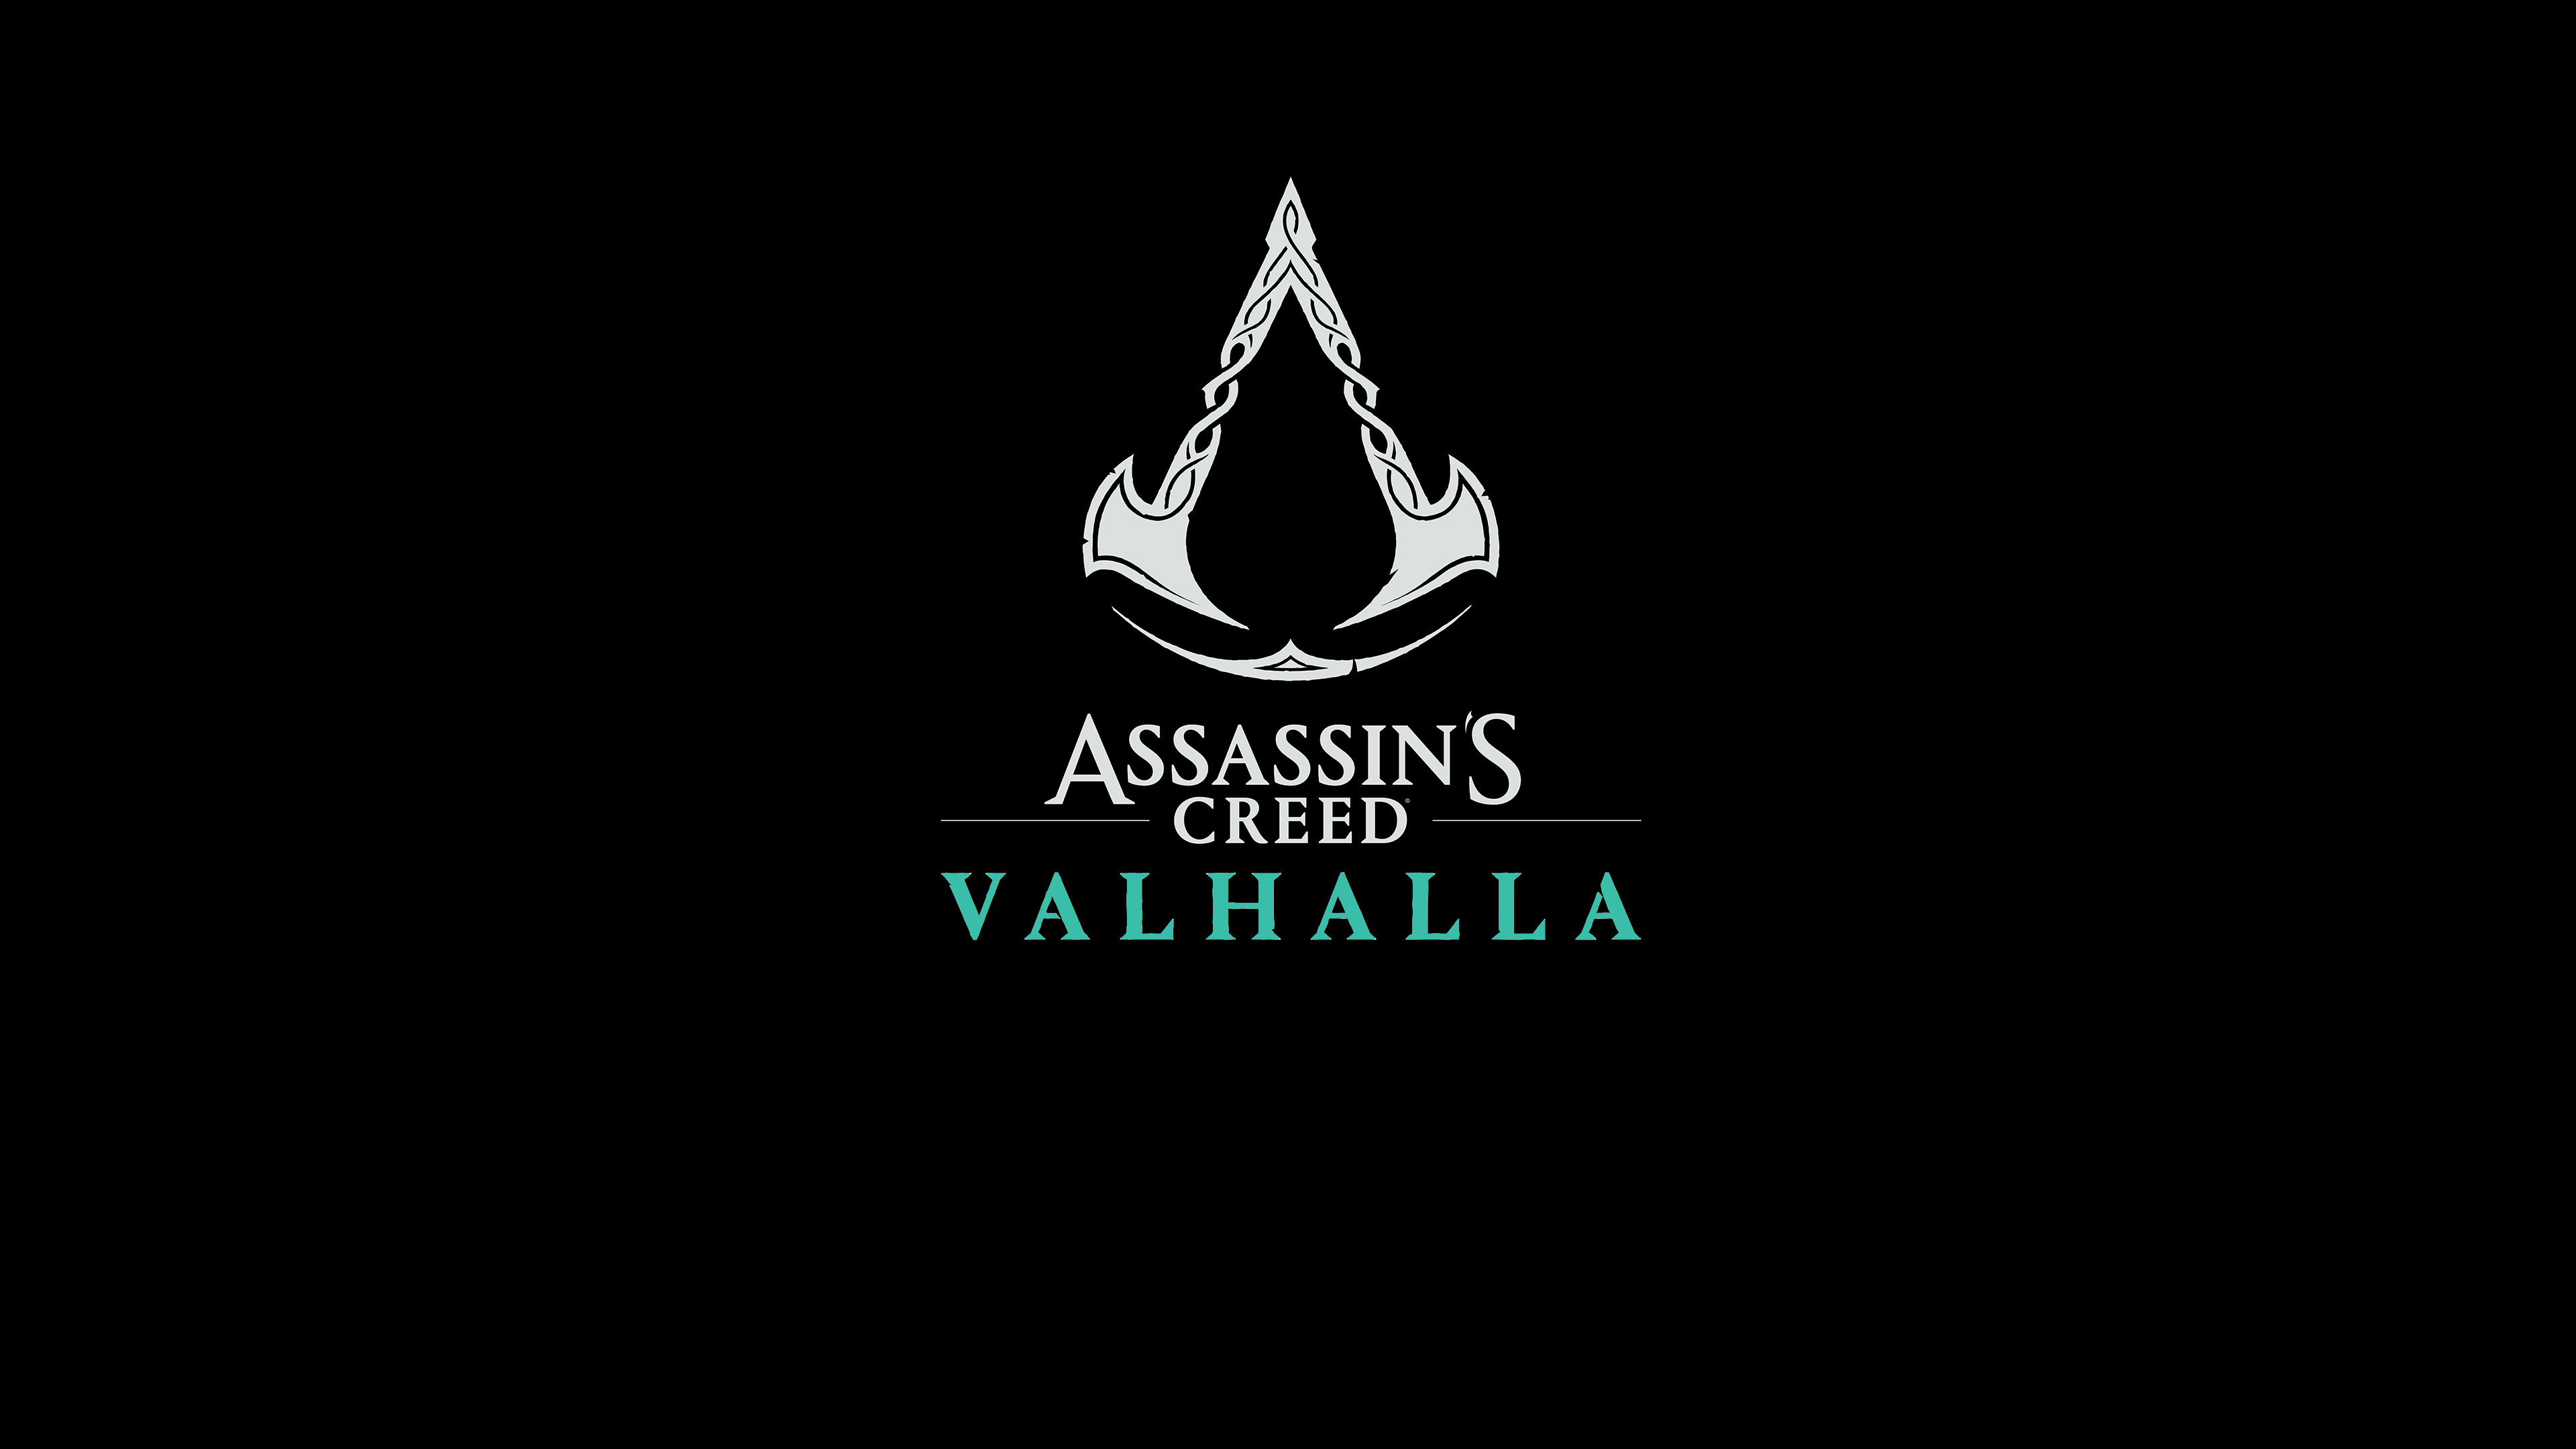 assassins creed valhalla female wallpaper 4k